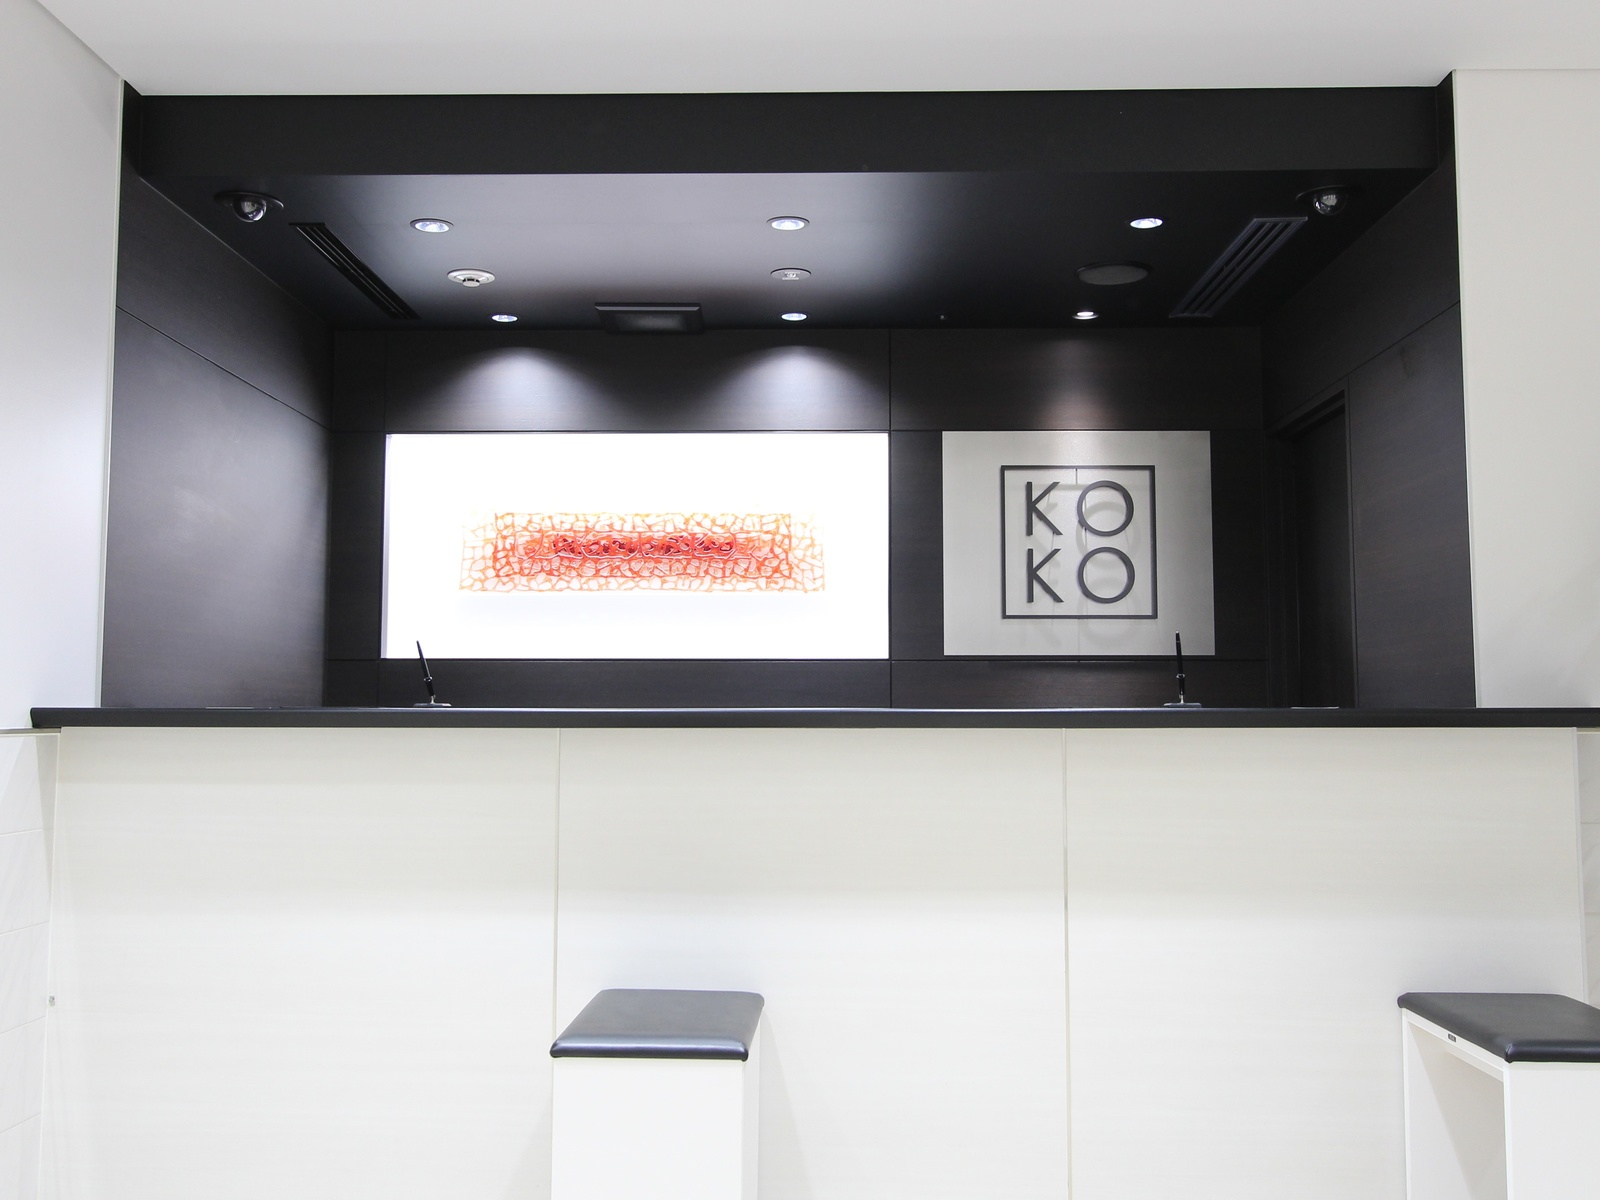 KOKO HOTEL 鹿児島天文館 / KOKO Hotels スタンダードプラン / 朝食付